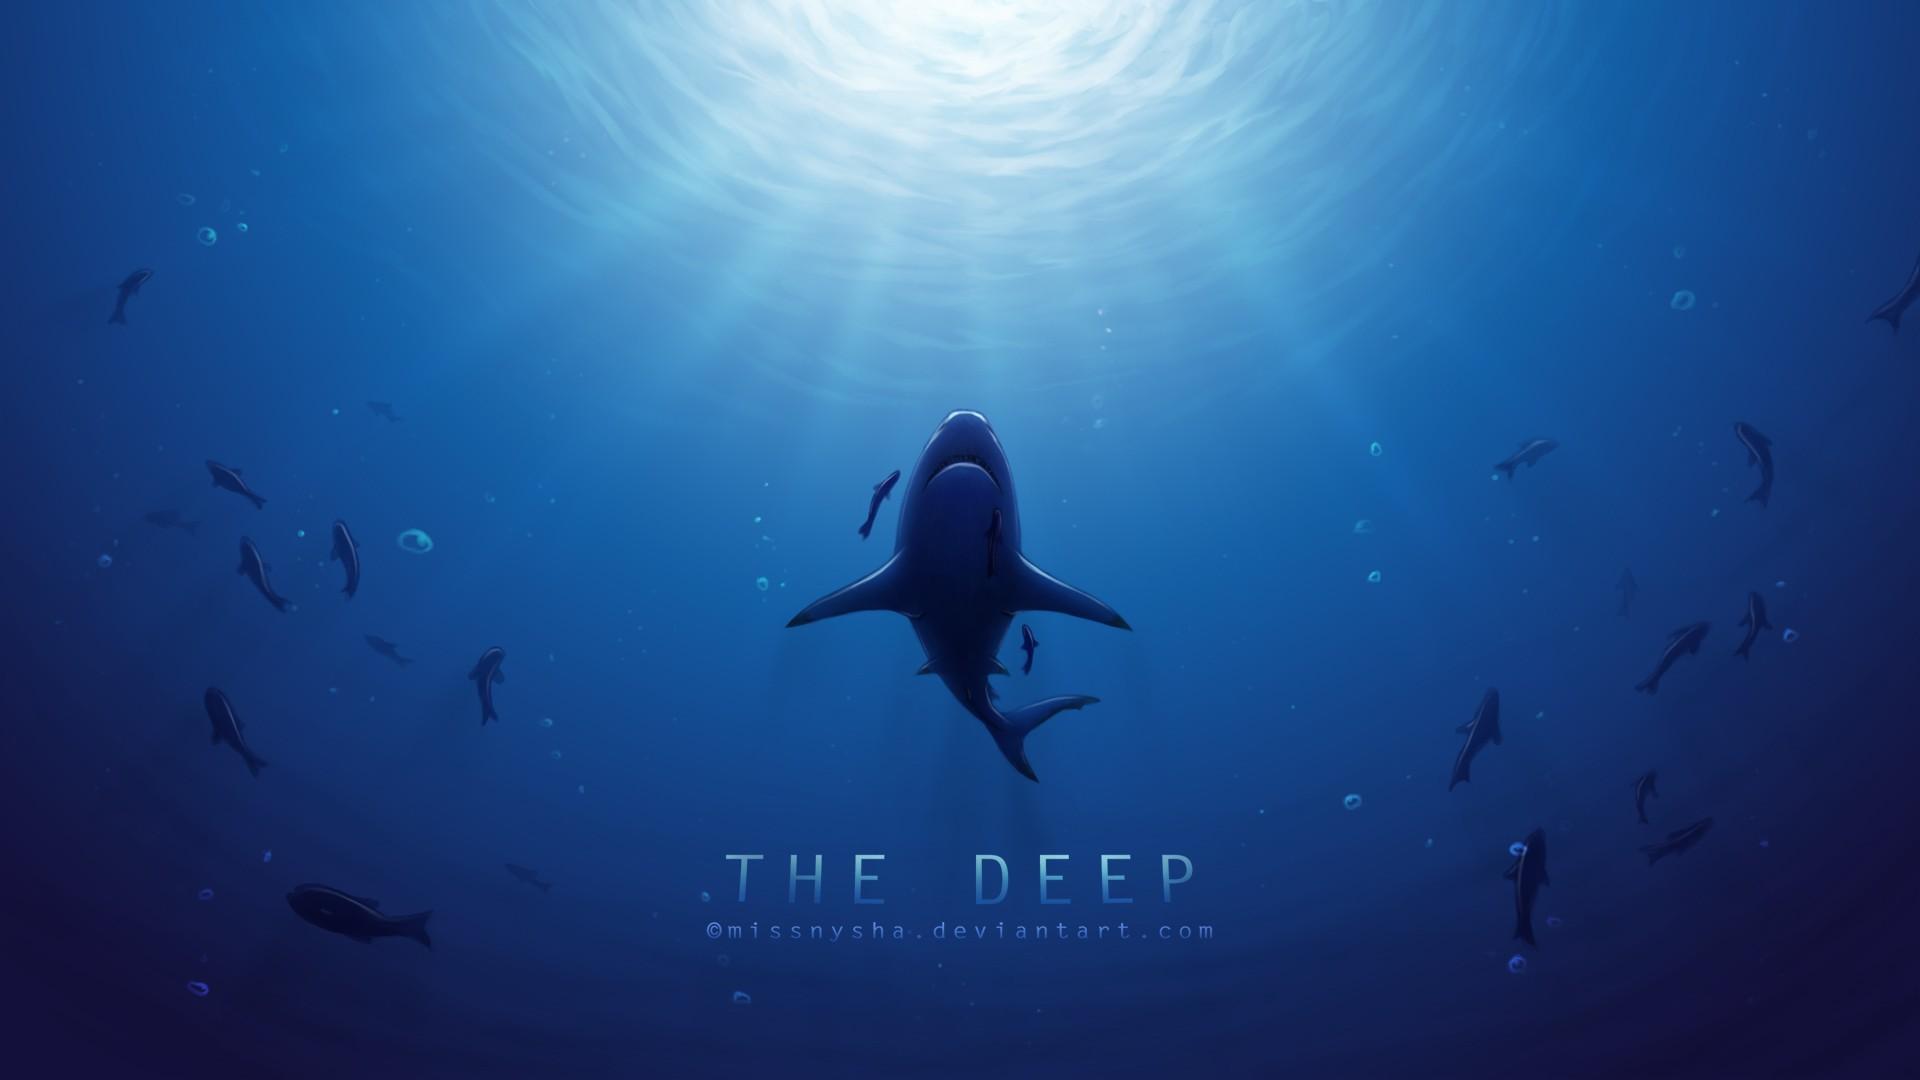 deep sea sharp wallpaper background 1920x1080